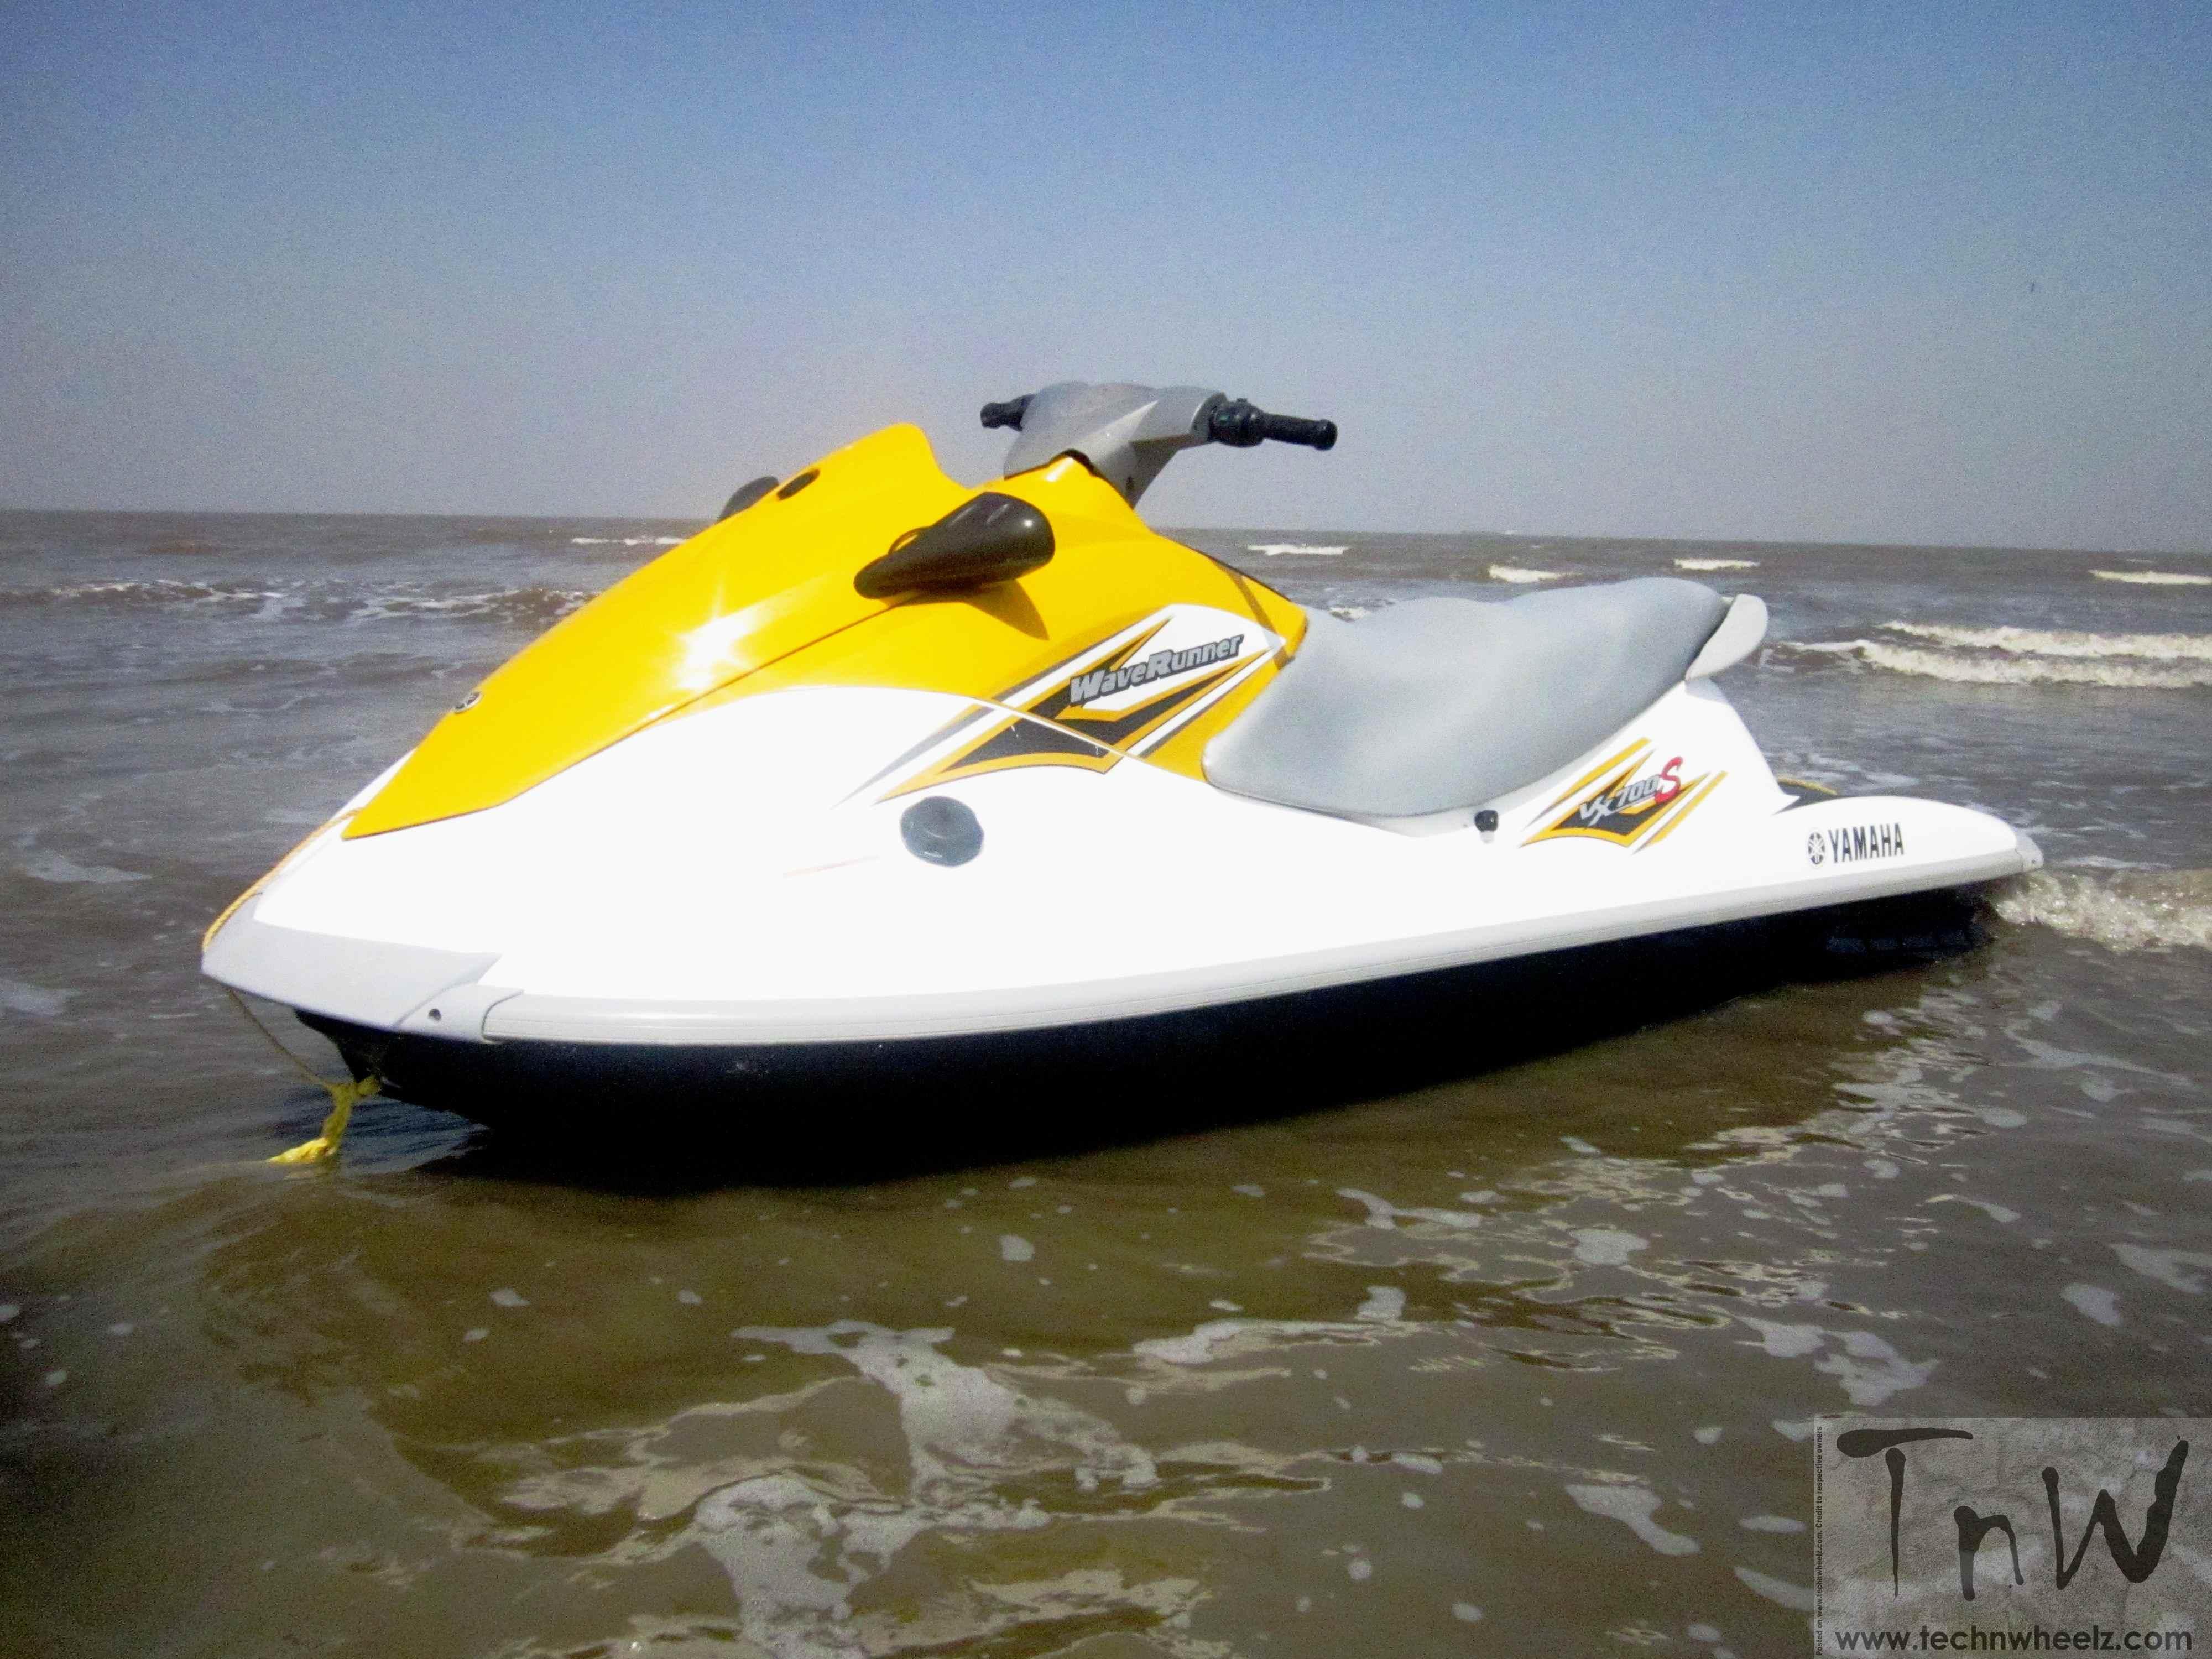 Yamaha vx700s jet ski 18 southern torque masters for Yamaha jet ski waverunner